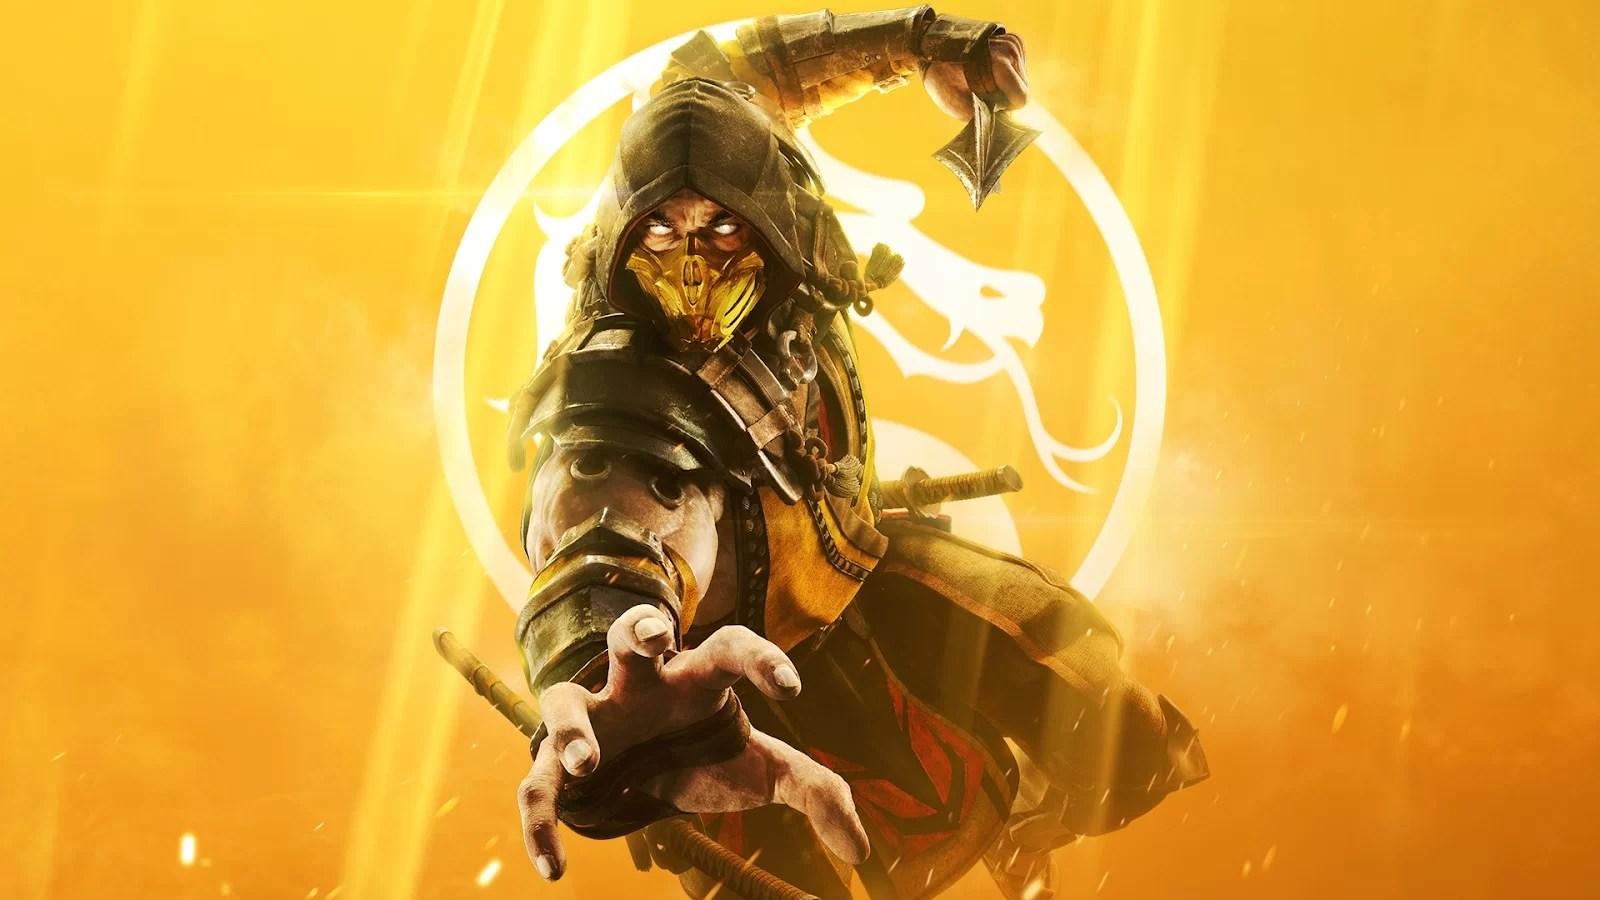 Mortal Kombat 11 Aftermath Kollection Review Mostly Komplete